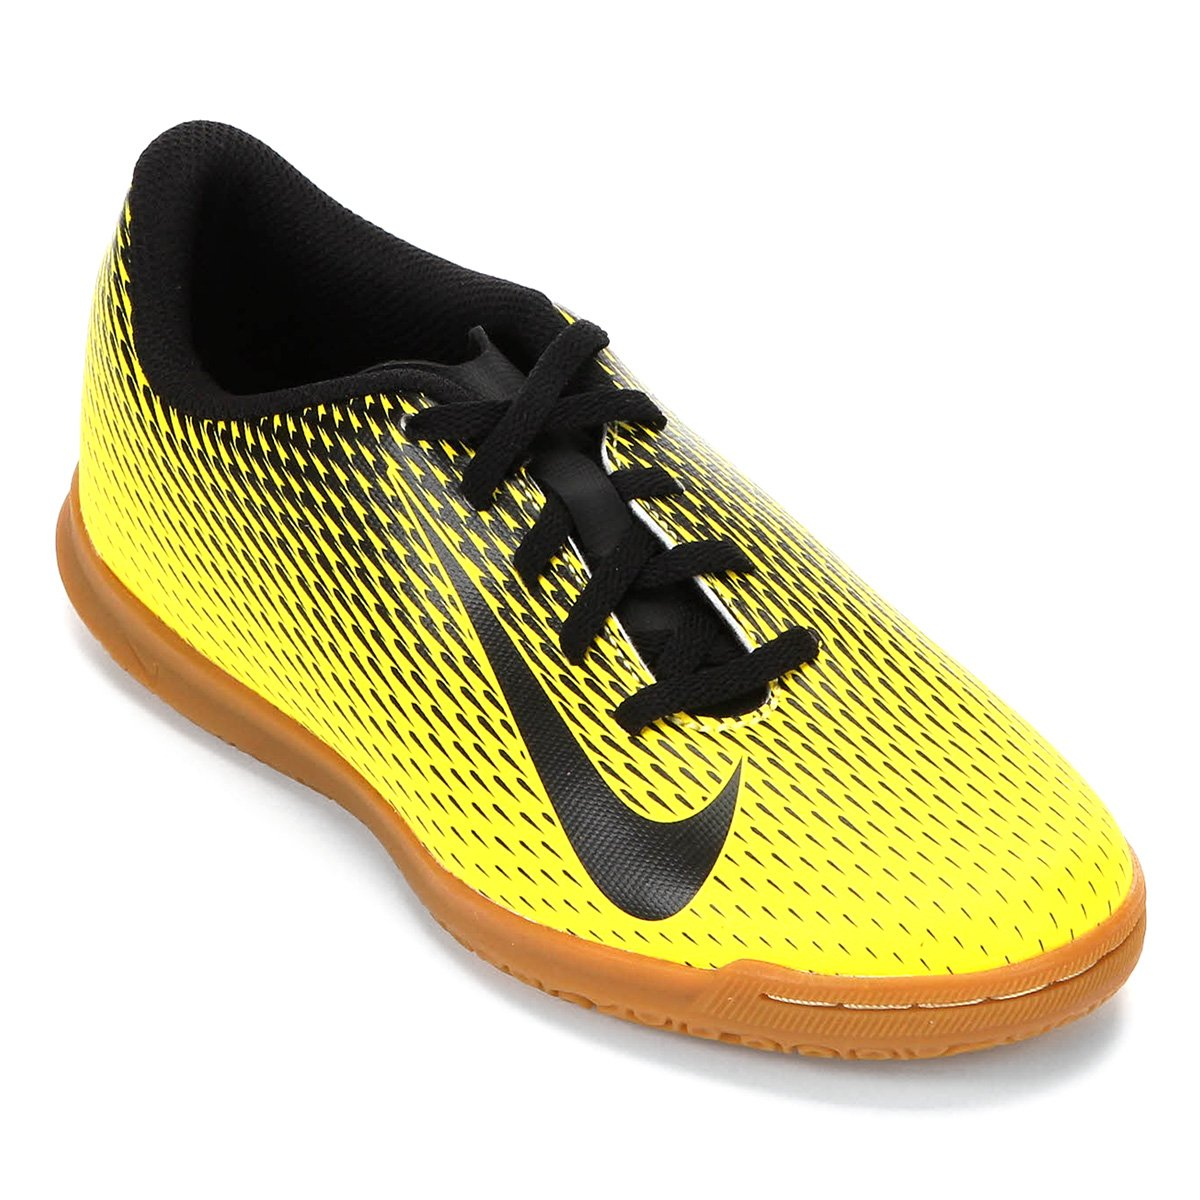 be029320e3 Chuteira Futsal Infantil Nike Bravata II IC - Amarelo e Preto ...